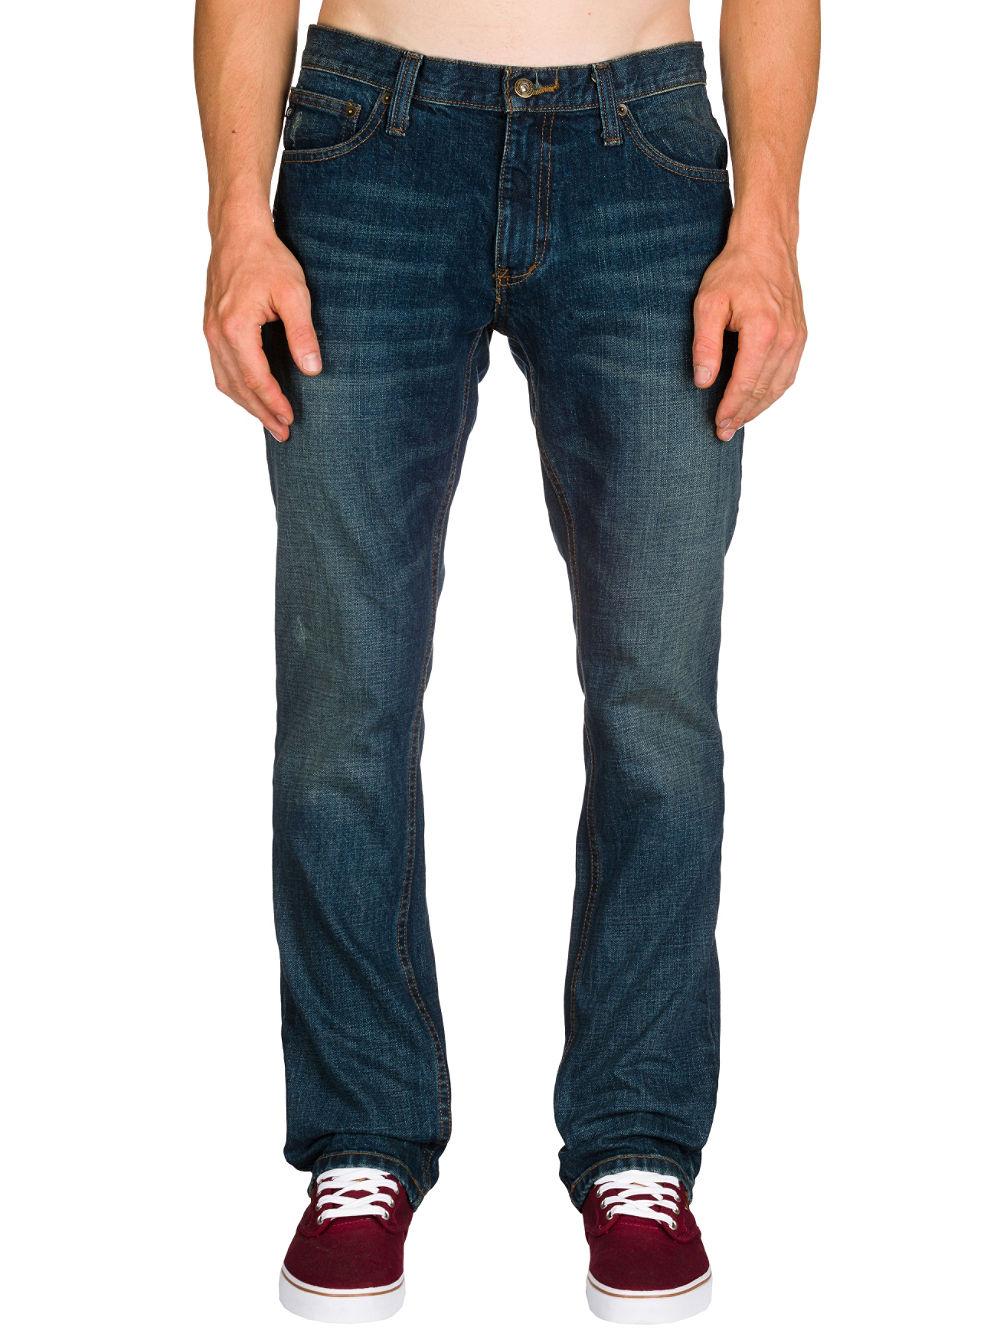 free-world-night-train-jeans